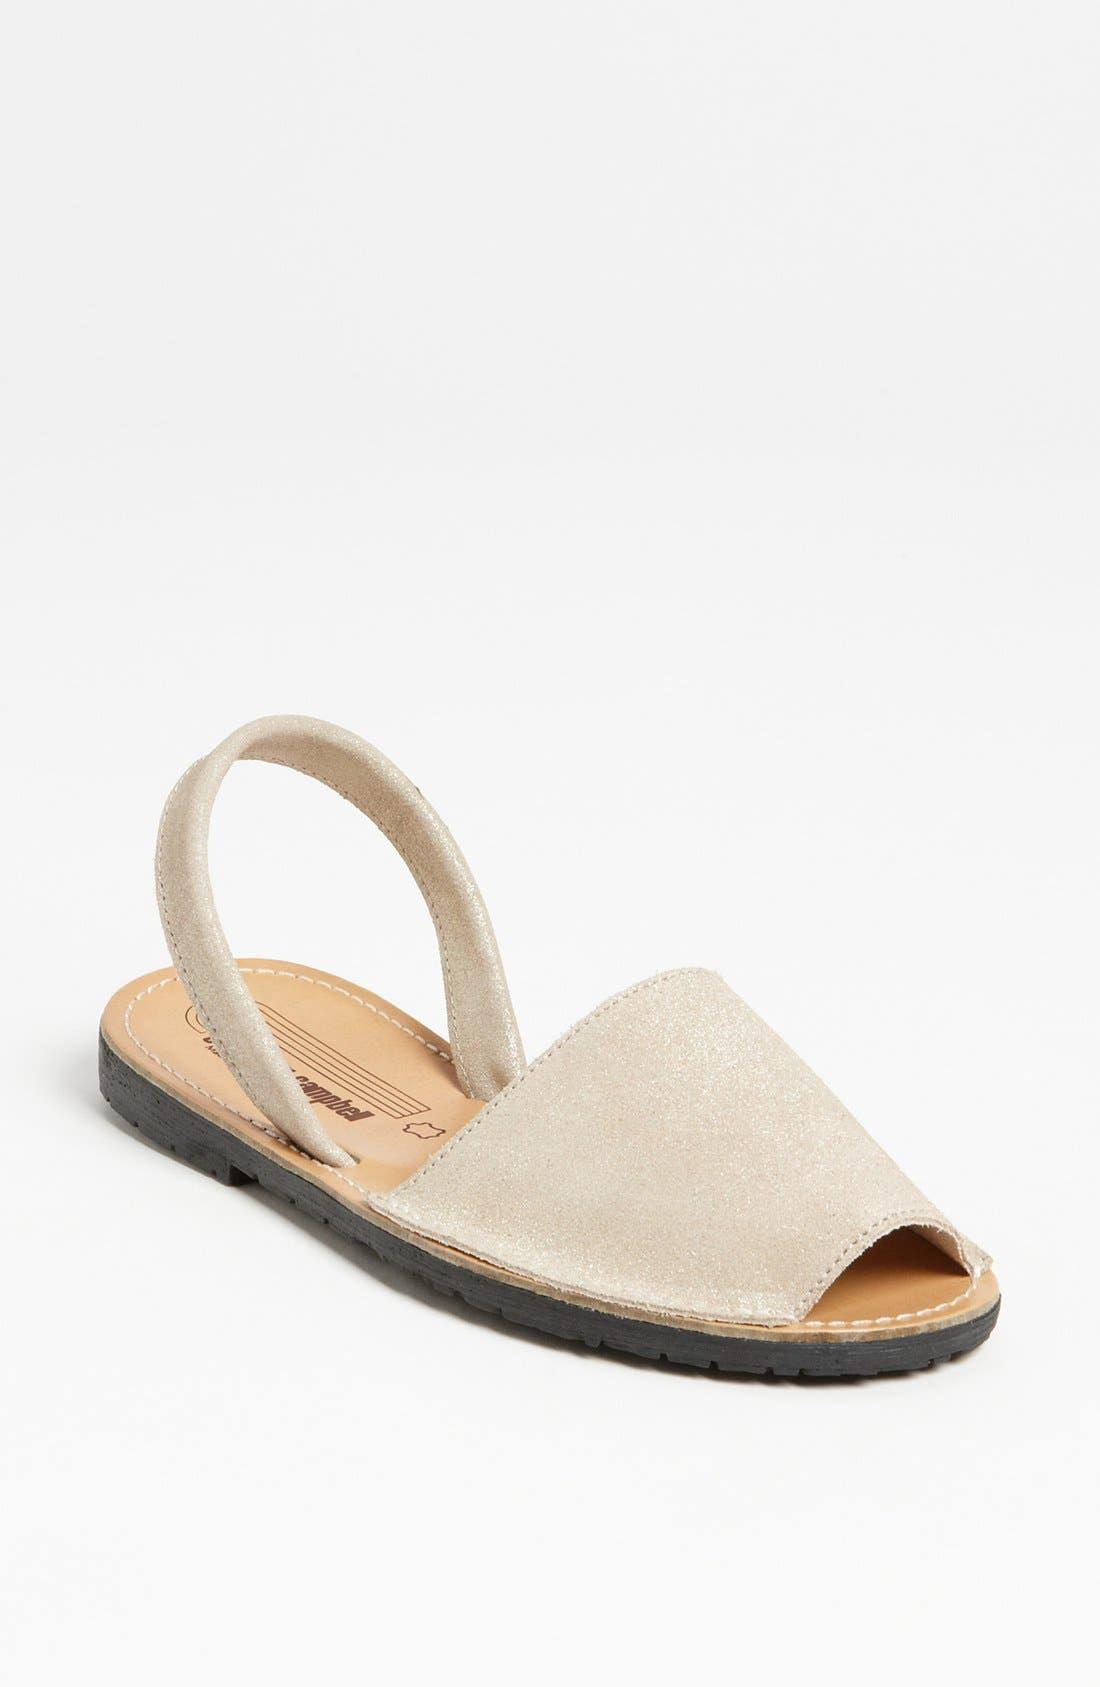 Alternate Image 1 Selected - Jeffrey Campbell 'Ibiza' Sandal